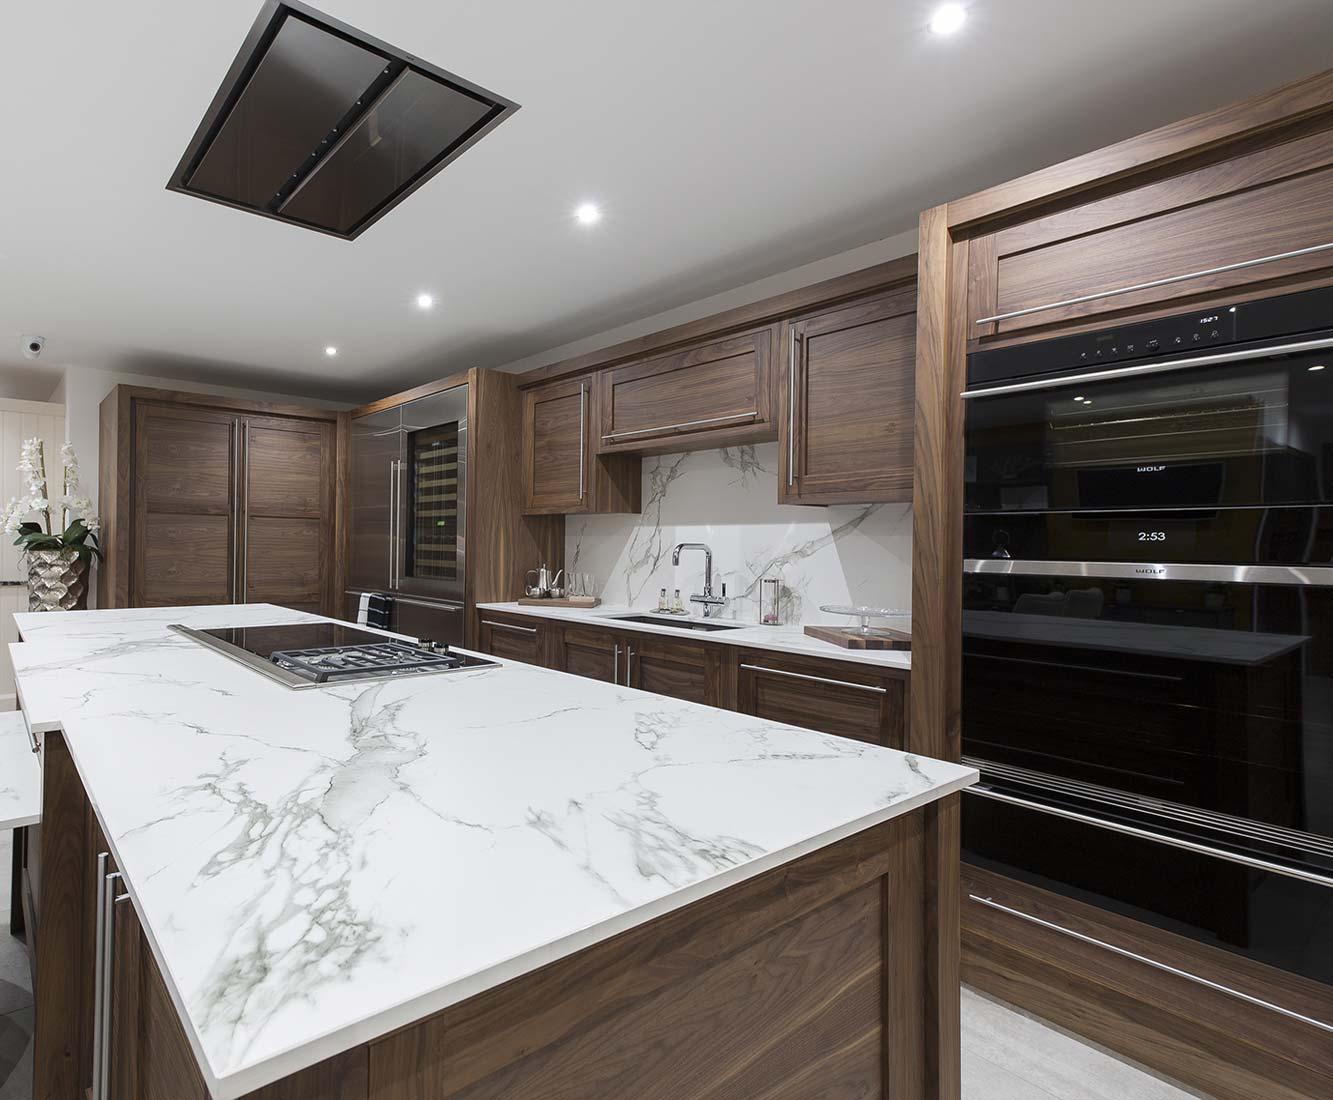 Frank-Anthony-Kitchens-Handbuilt-Handcrafted-Walnut-Blakelidge-Dekton